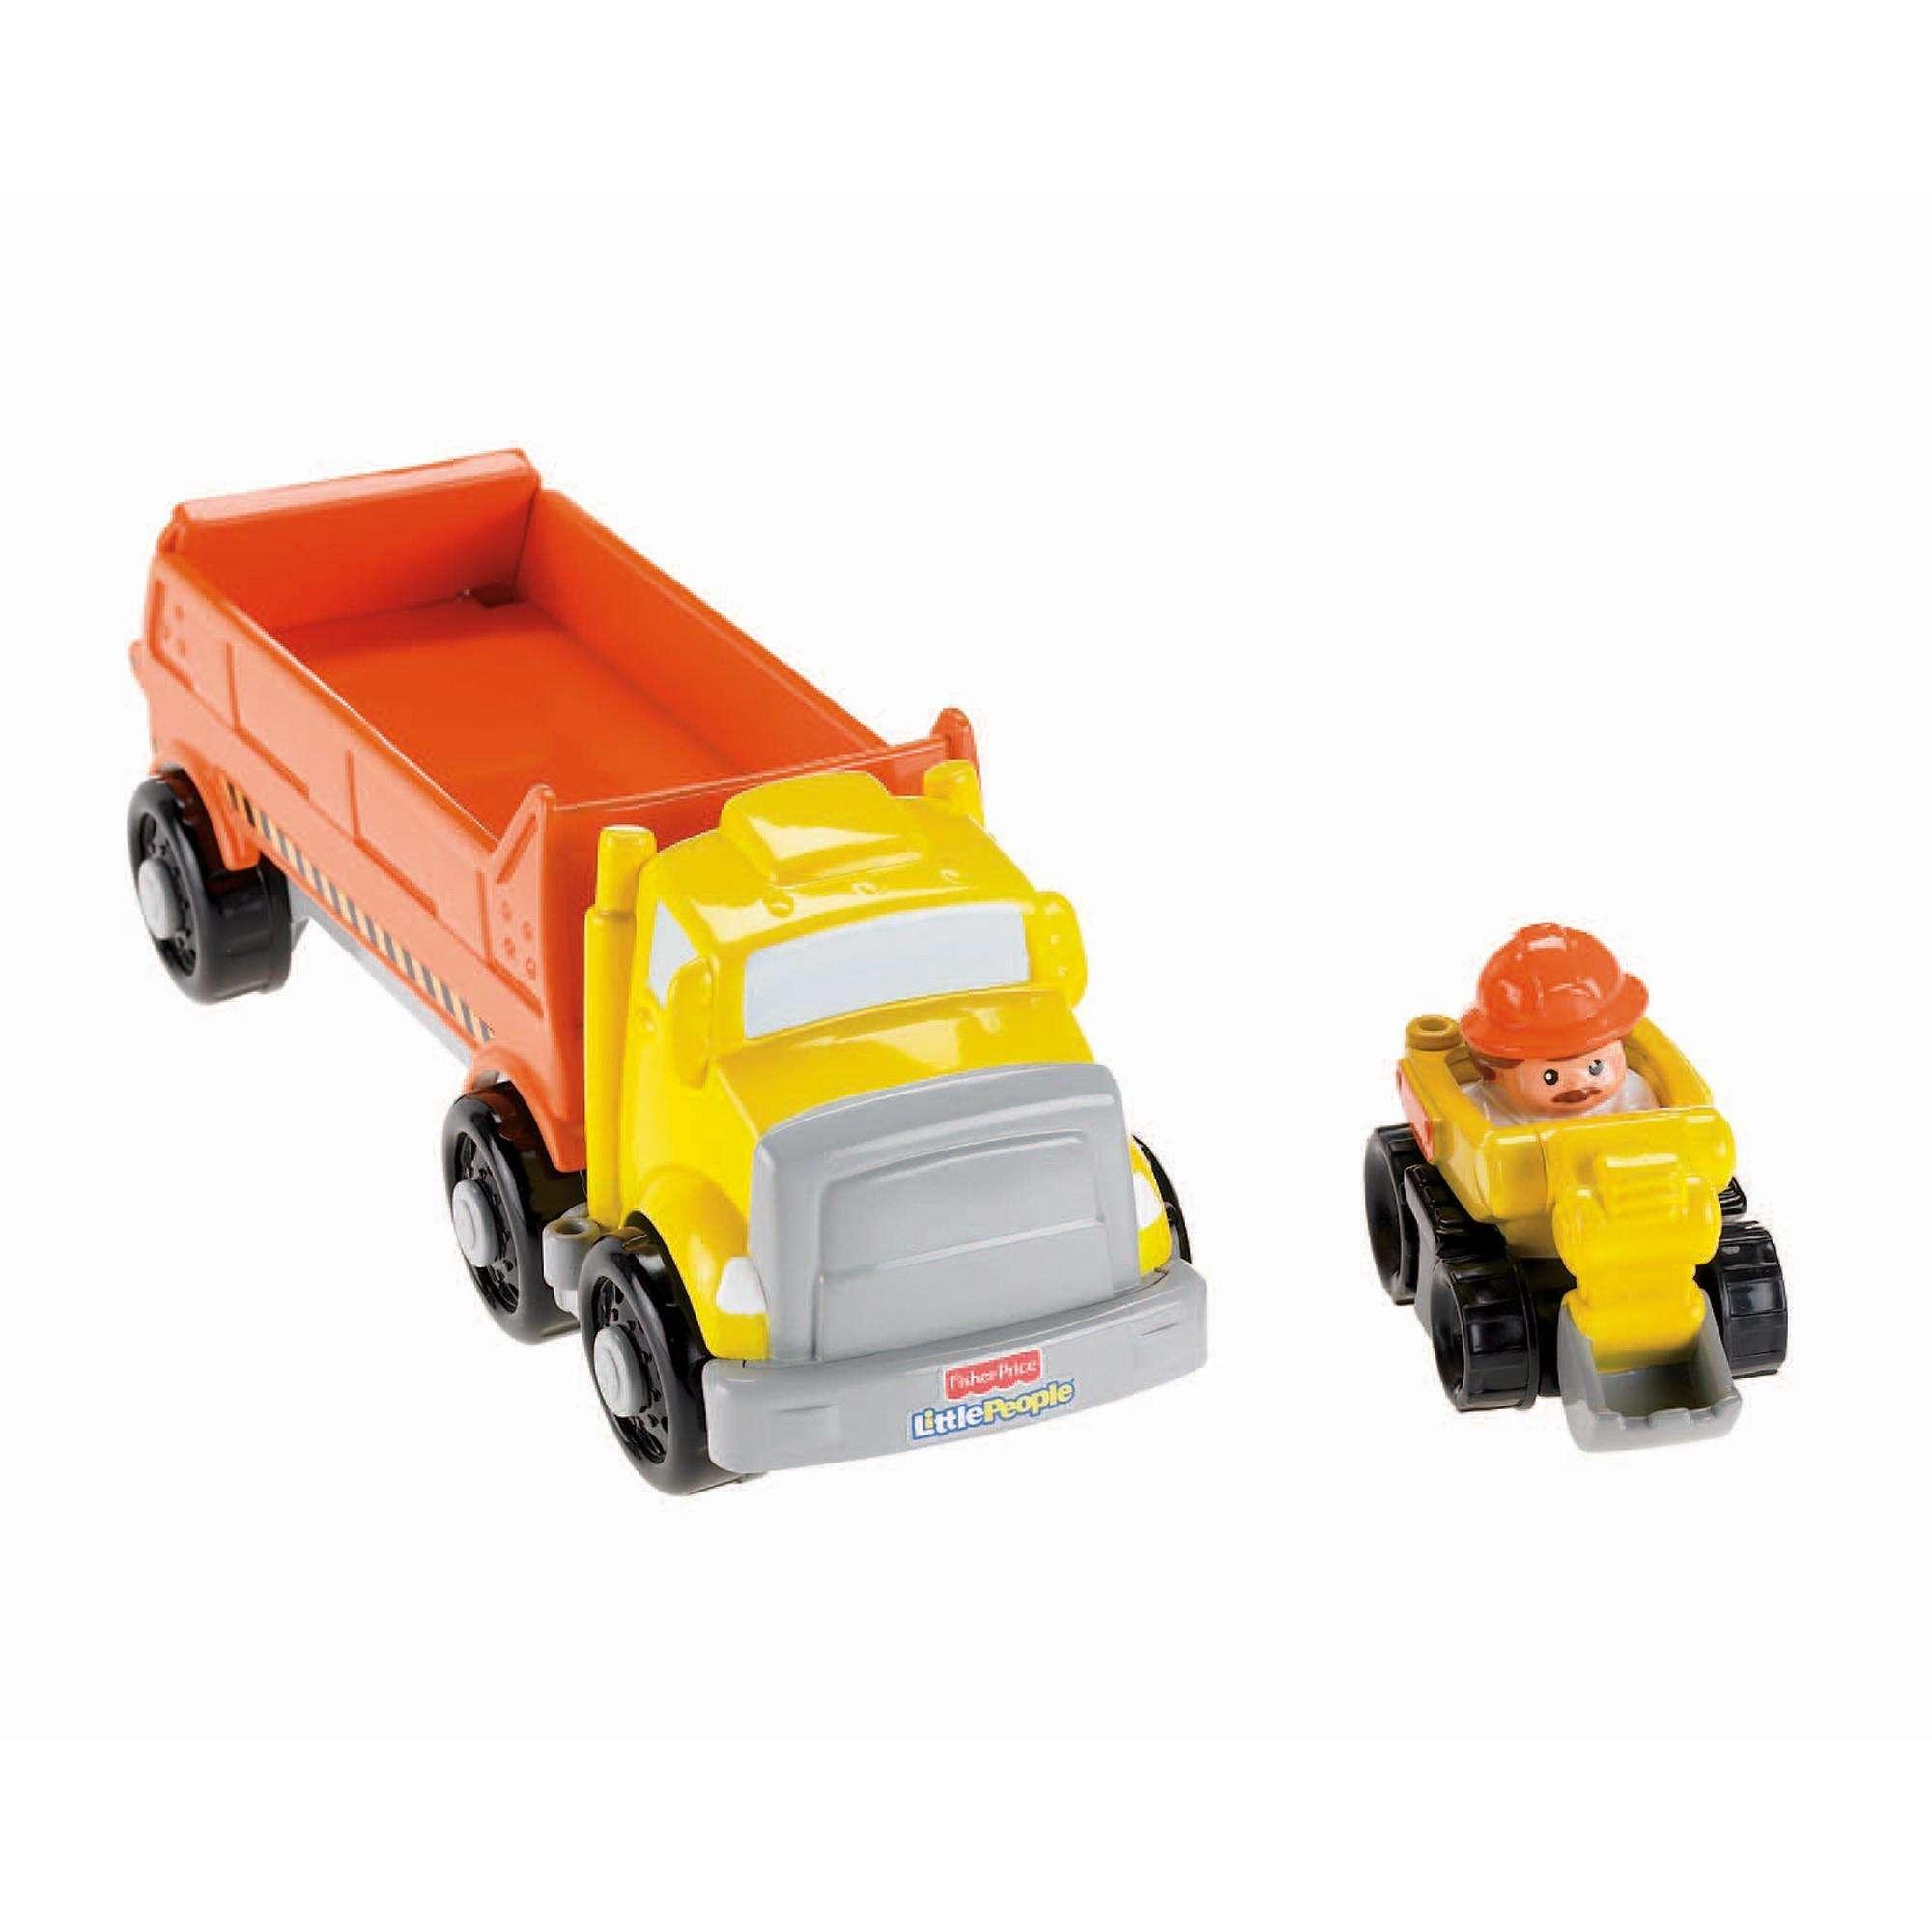 Little People Wheelies Car Carrier Construction